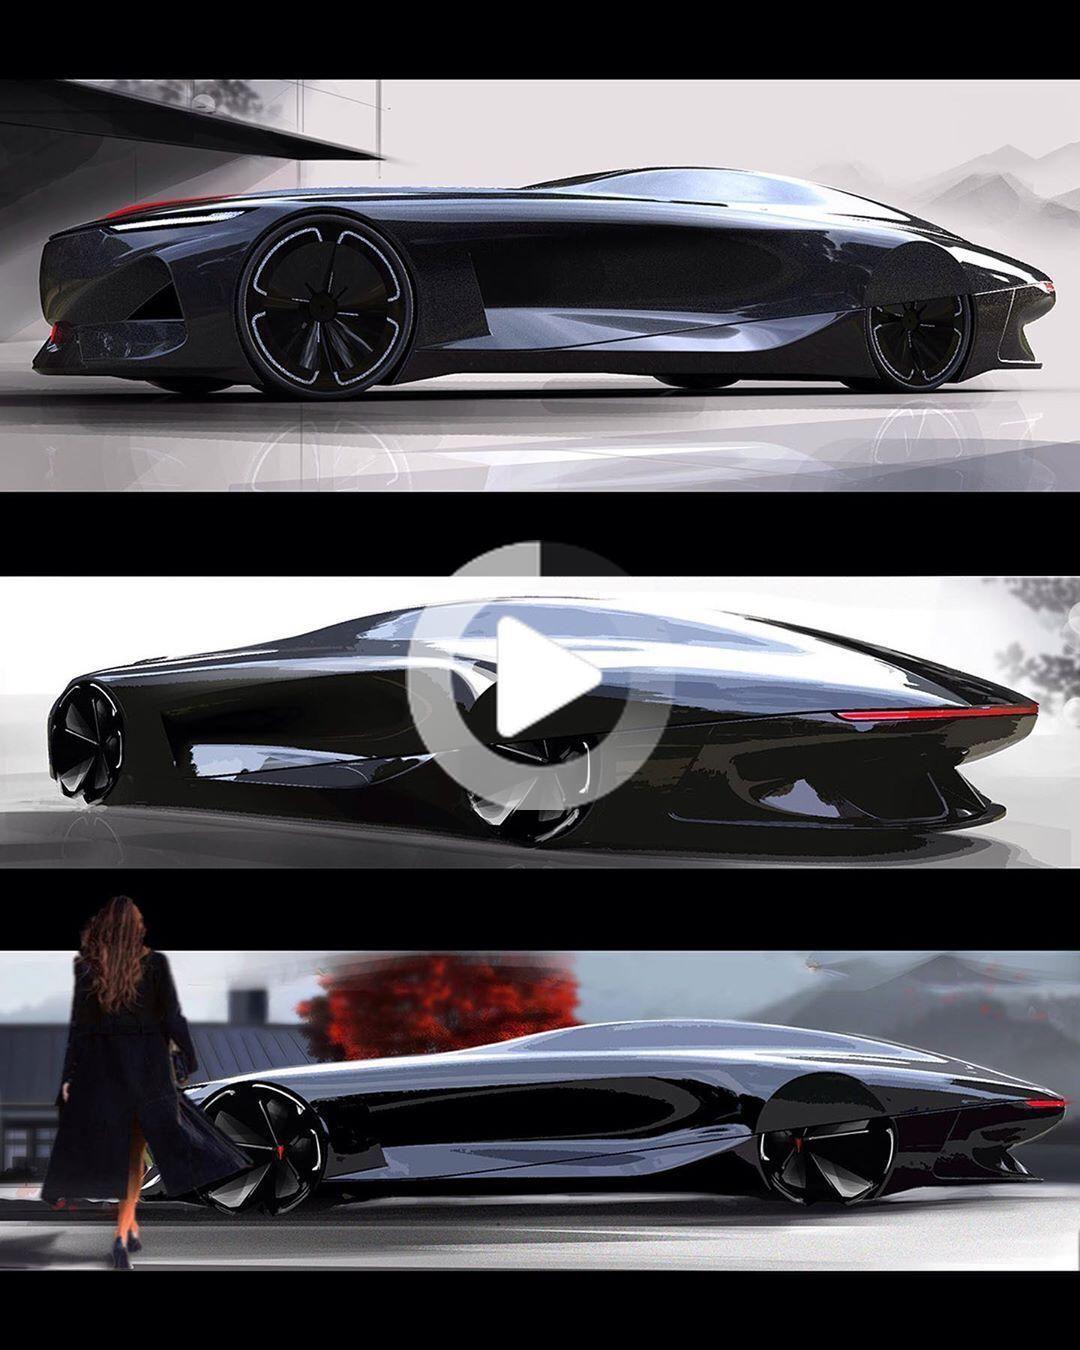 @cardesignworld car design drive luxury car luxury car tuning cars for future concept car design #cars #carideas